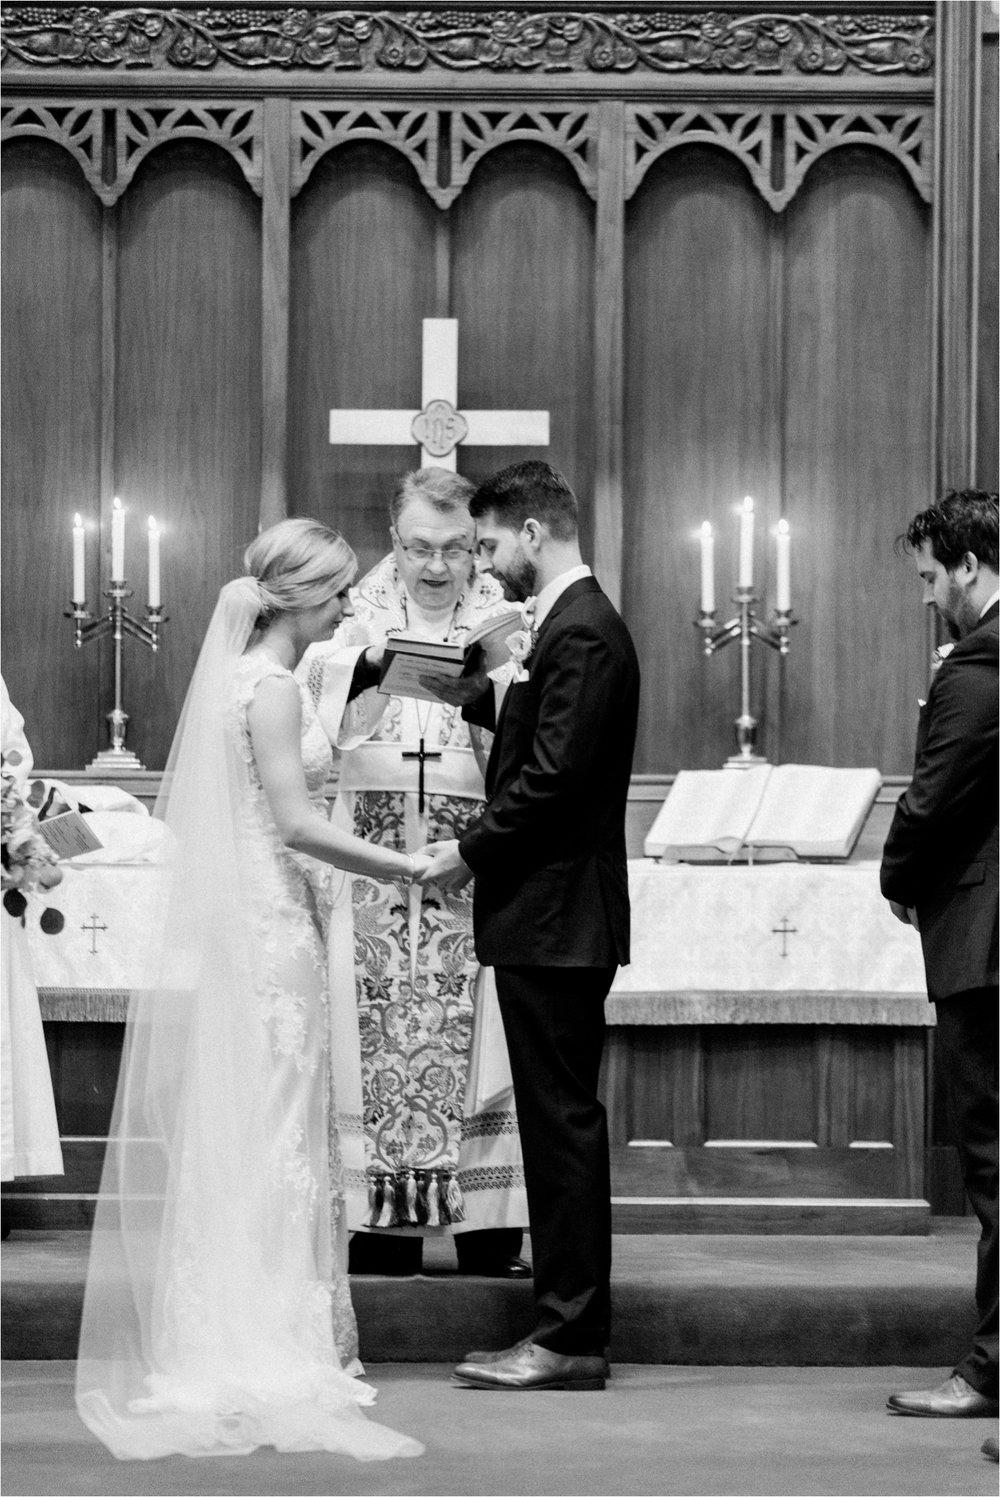 virginia-wedding-photographer-theoverlook-wedding-photo_0053.jpg